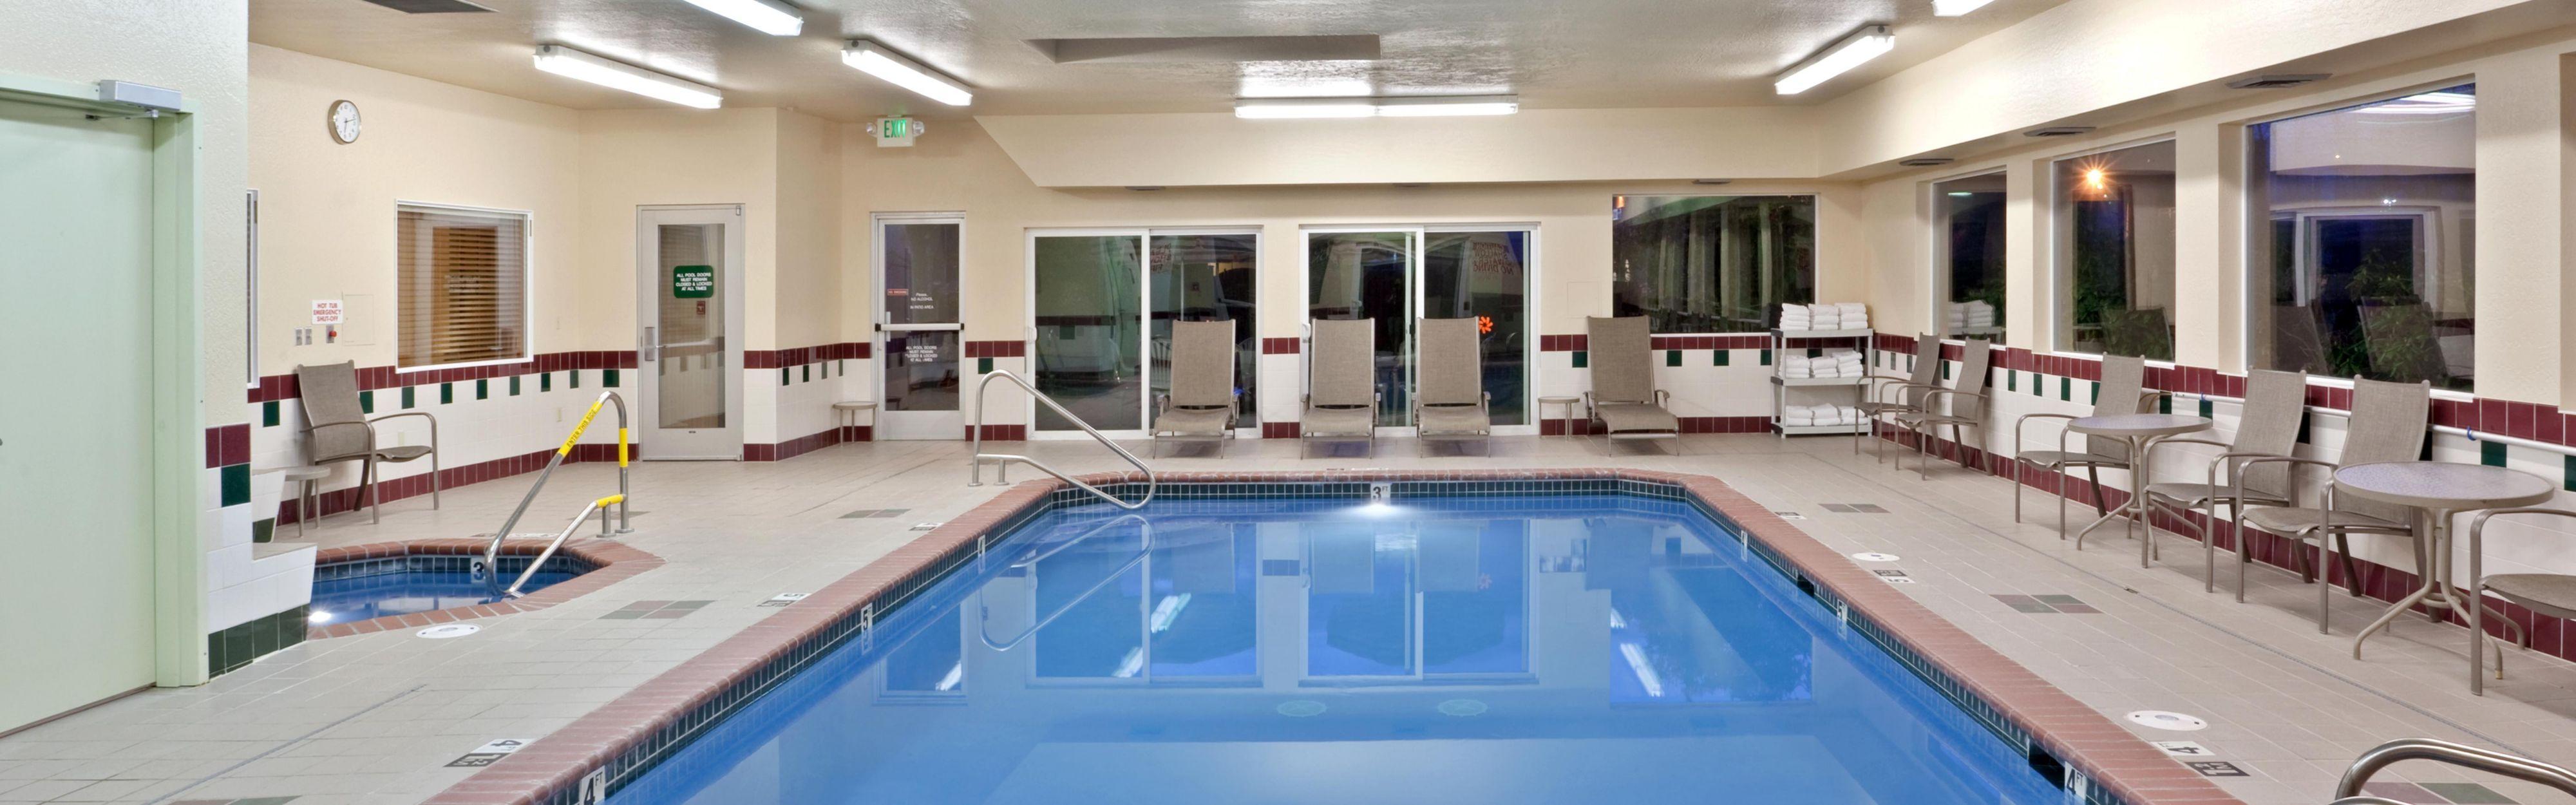 Holiday Inn Express & Suites Burlington image 2